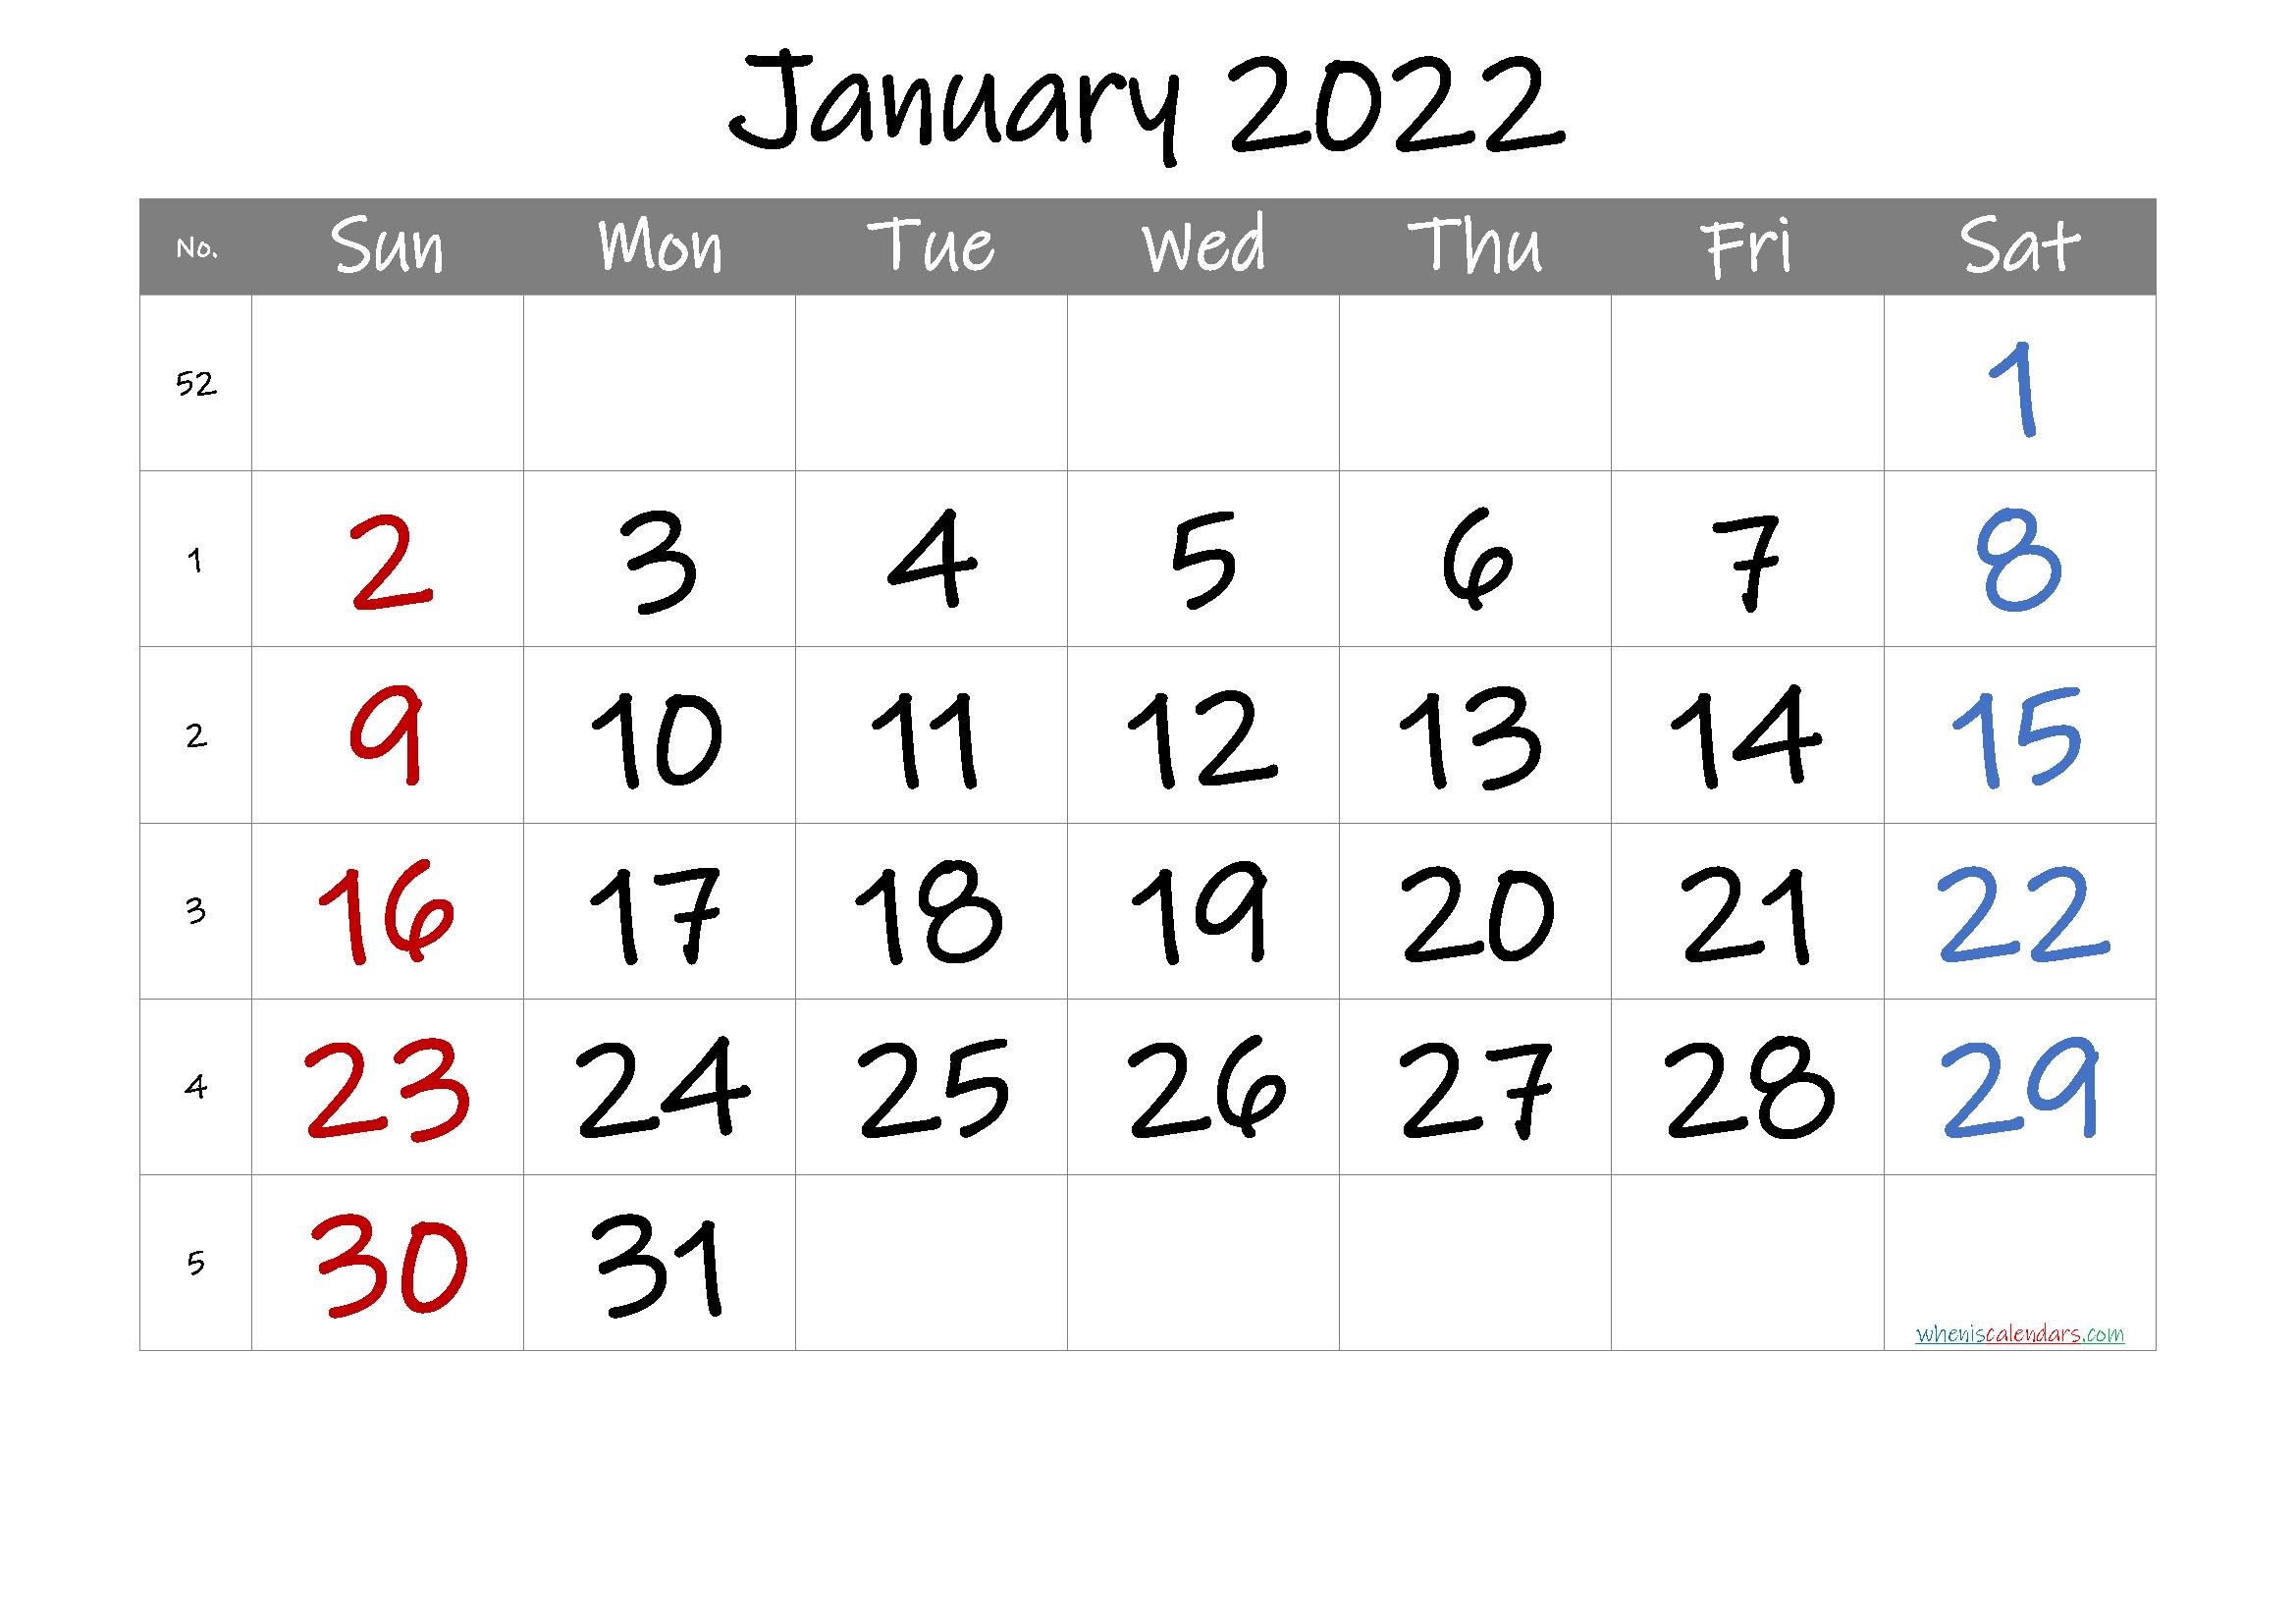 2022 January Calendar Printable.2022 January Free Printable Calendar 6 Templates In 2021 Free Printable Calendar Printable Calendar Calendar Printables